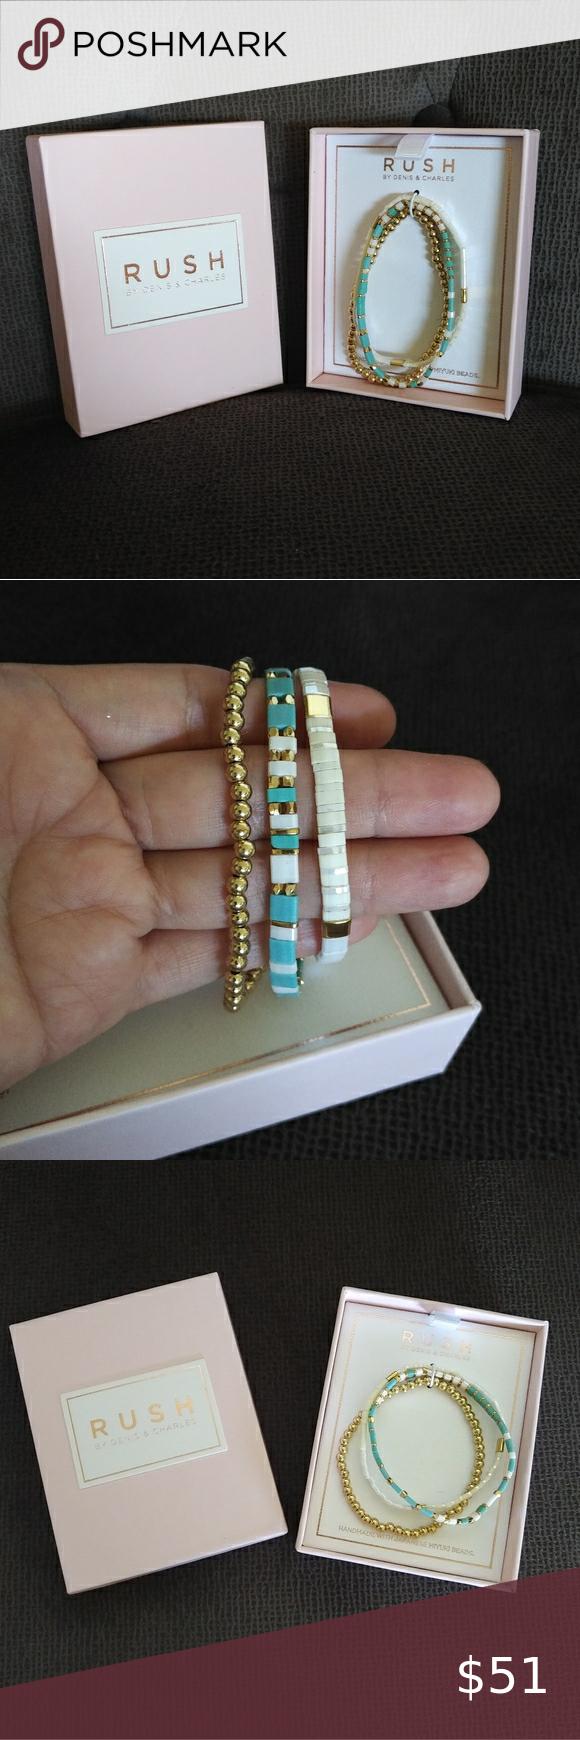 Bracelet *Color Rush* Colorful *Handmade*